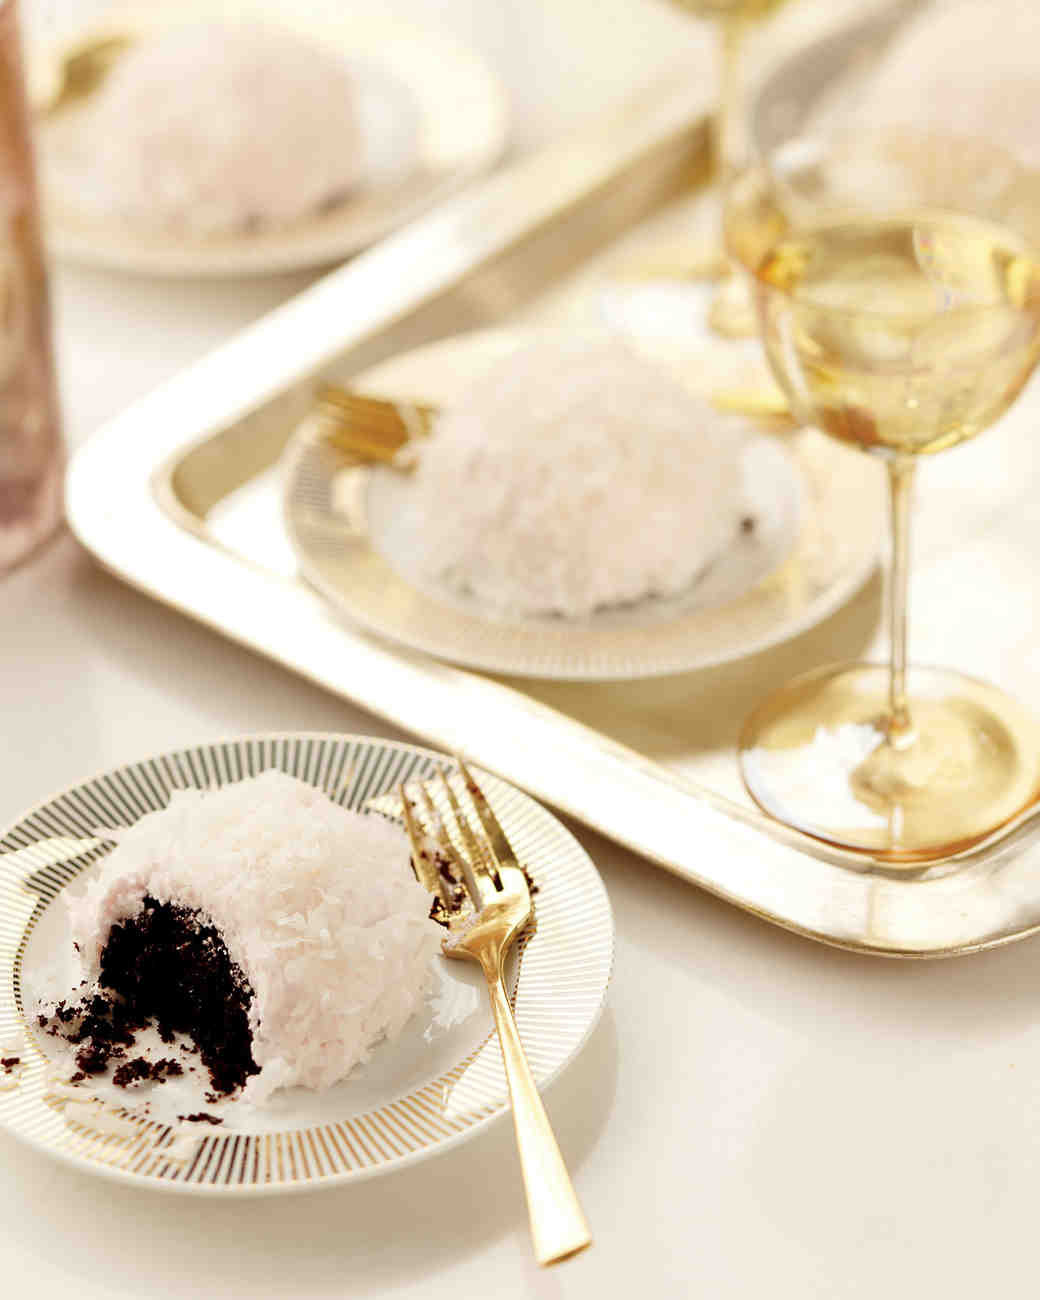 Wedding Cake Recipes Martha Stewart  29 Chocolate Wedding Cake Ideas That Will Blow Your Guests